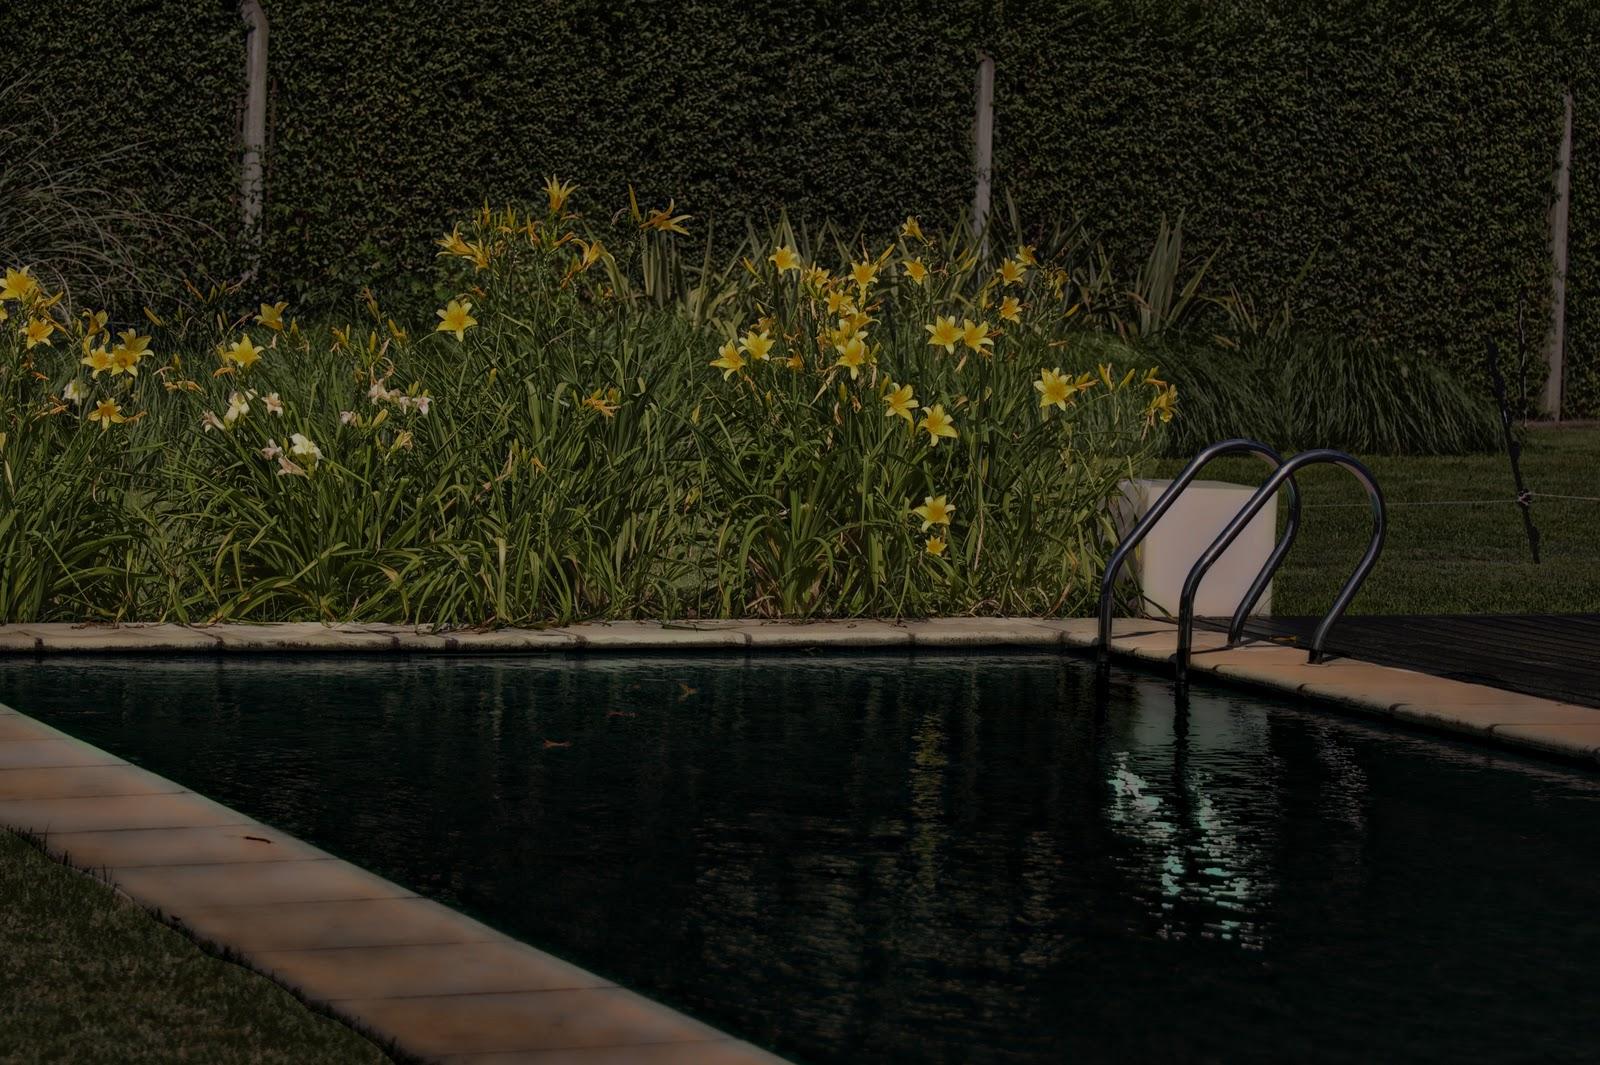 Jardines y paisajismo - Jardines y paisajismo ...